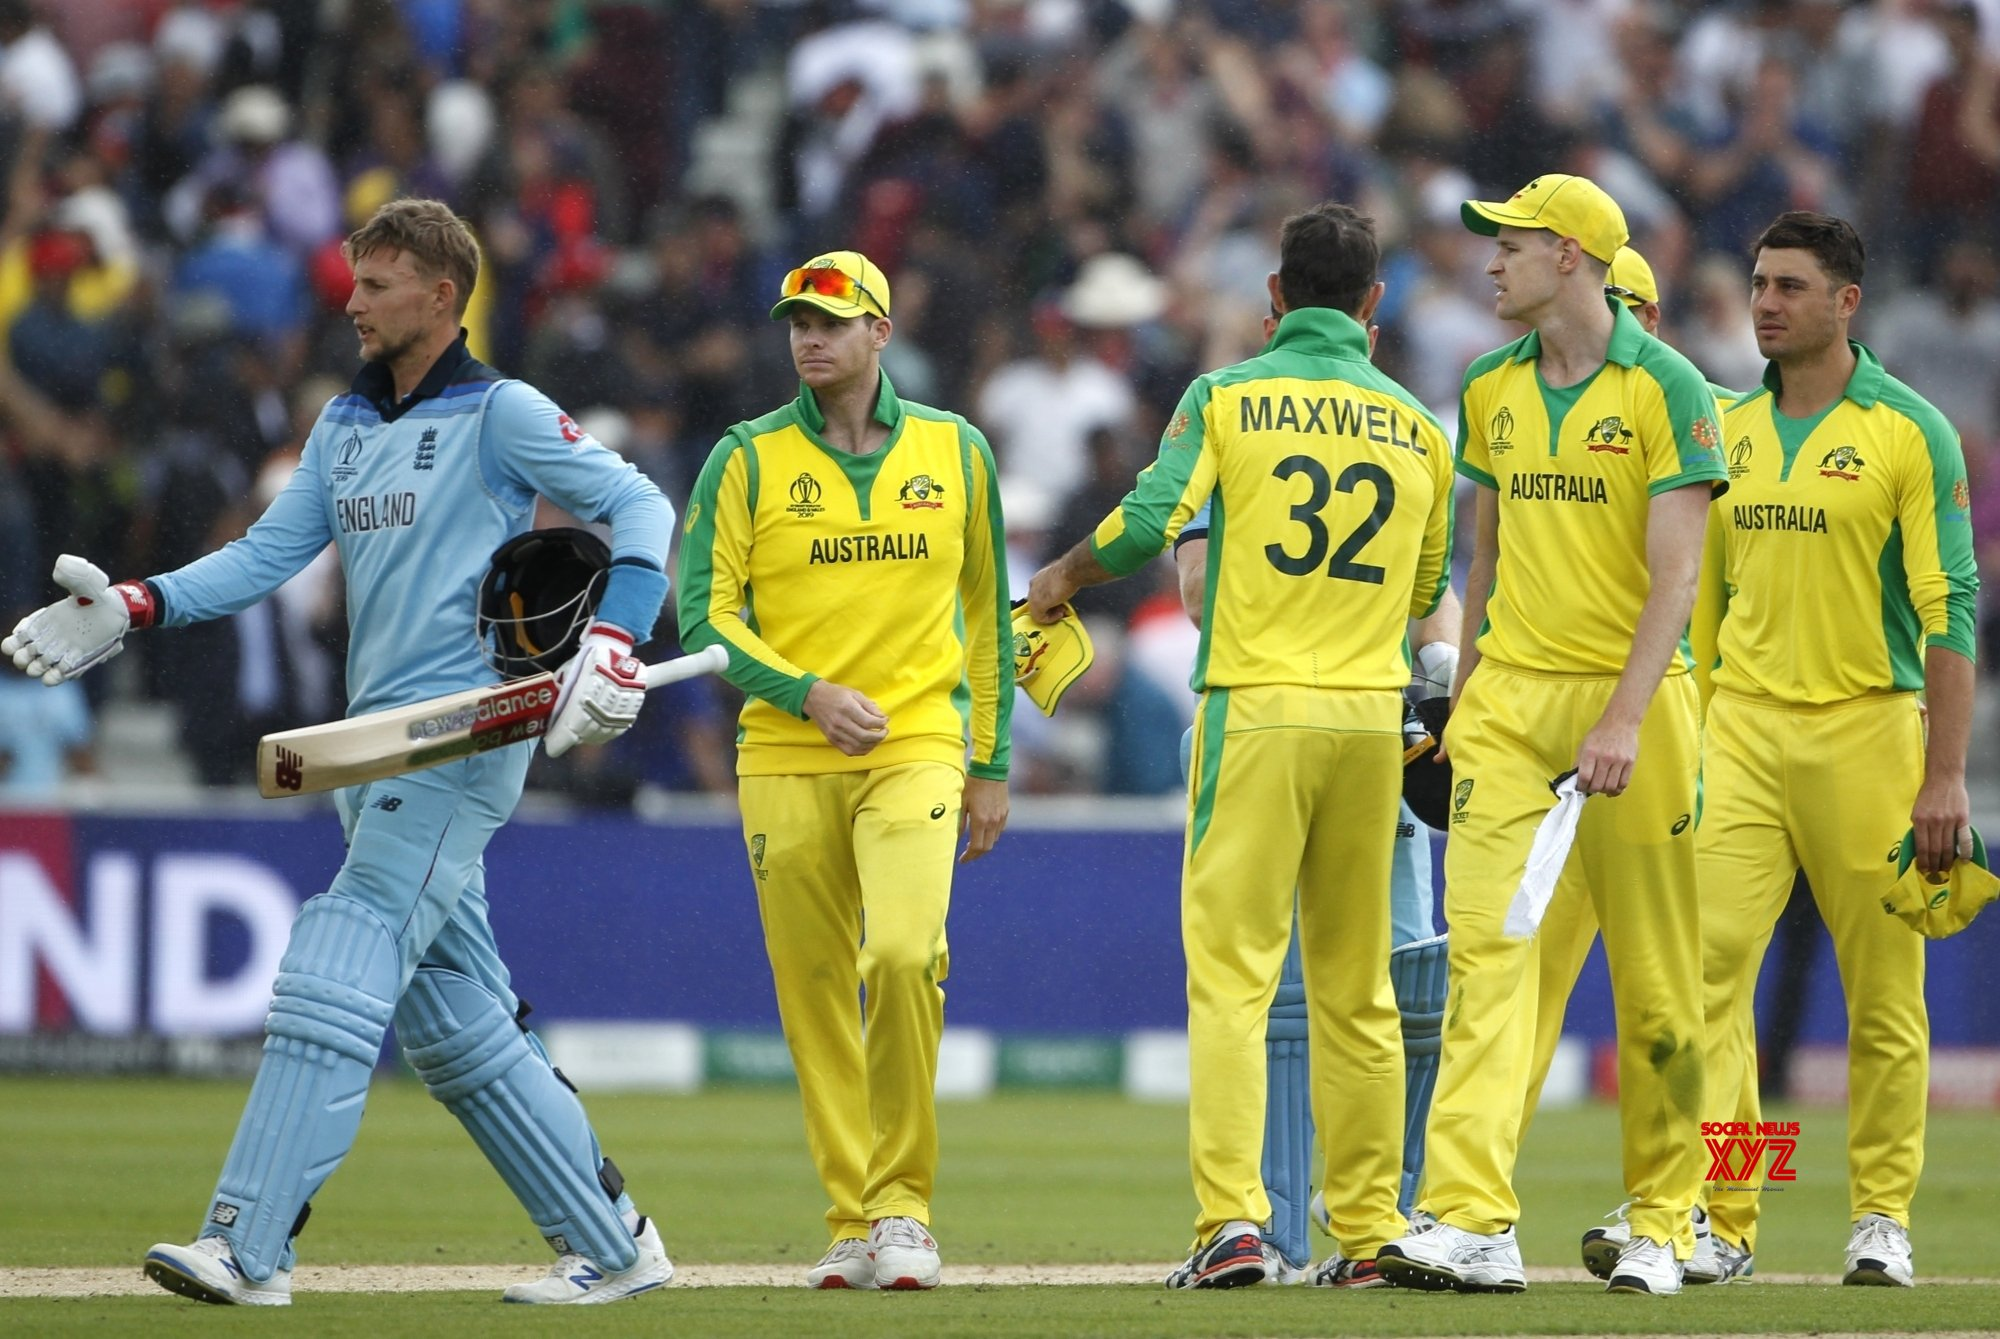 Birmingham (England): 2019 World Cup - 2nd Semi - final - Australia Vs England (Batch - 45) #Gallery